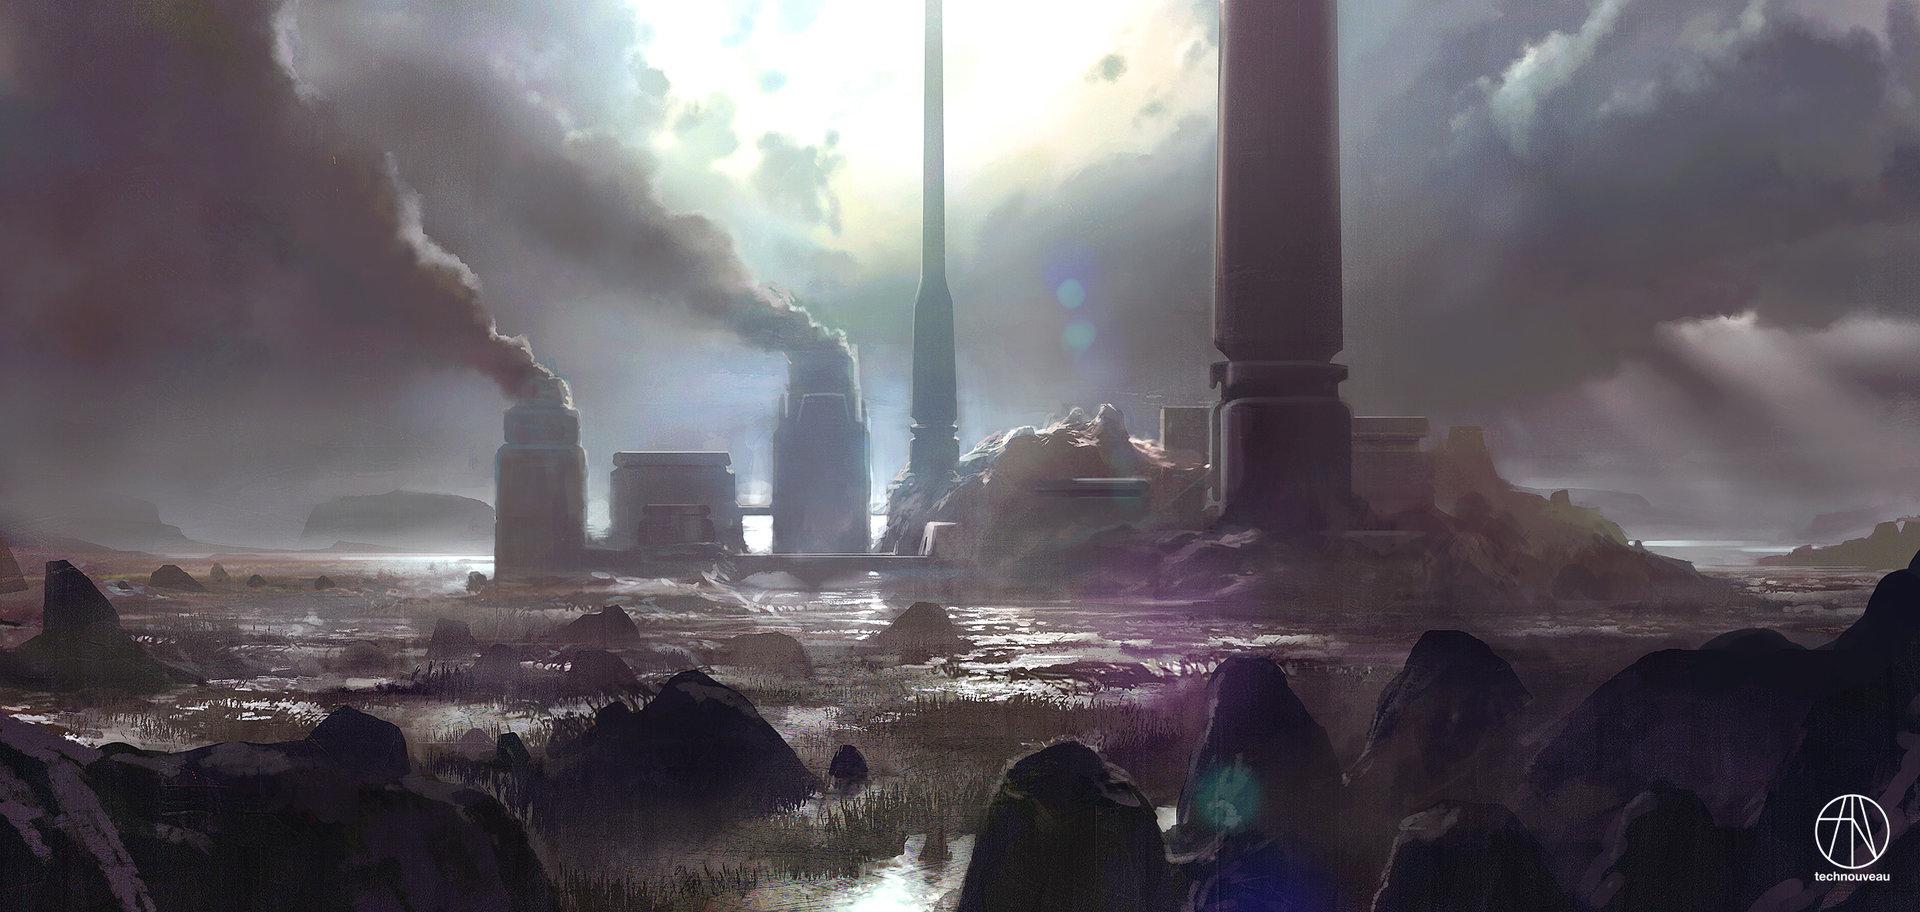 Rasmus poulsen interplanetary gunnery station